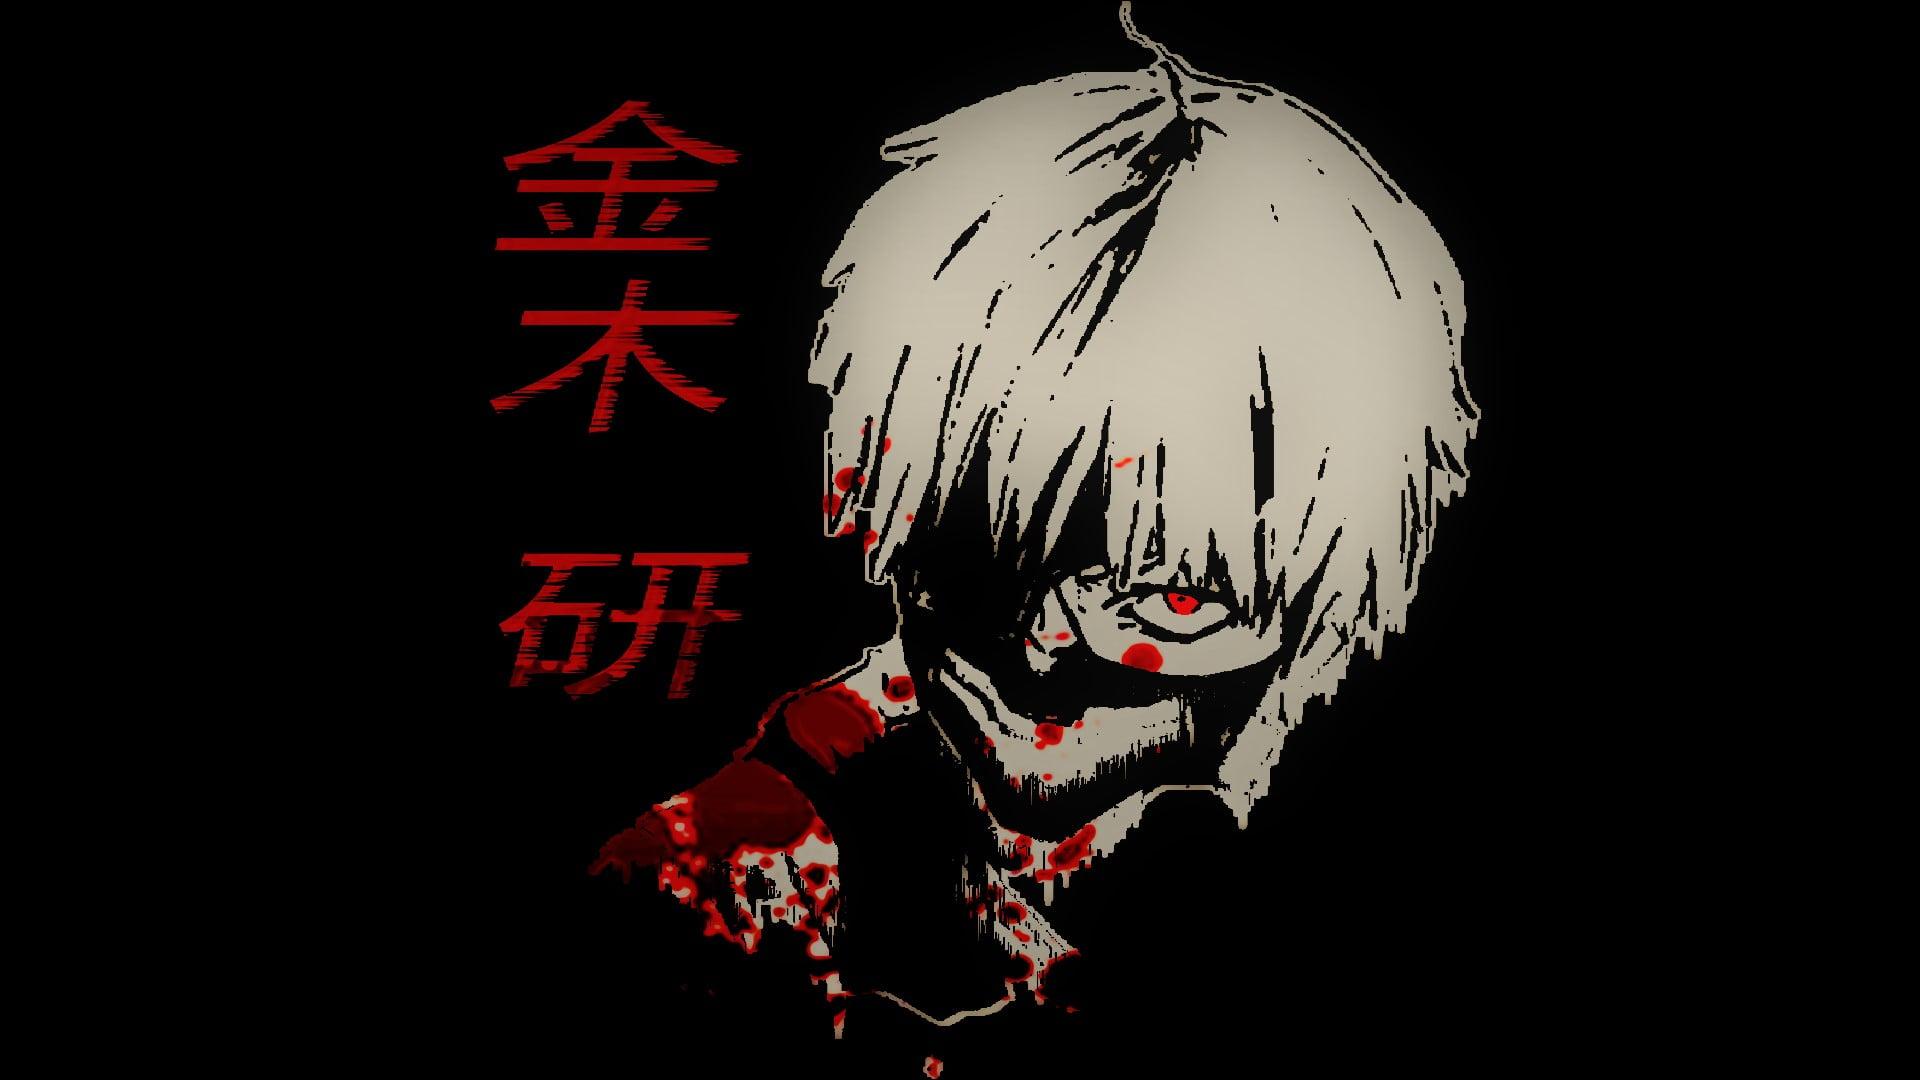 Hd wallpaper for desktop and mobile. 19++ Wallpaper Anime Tokyo Ghoul Hd - Tachi Wallpaper